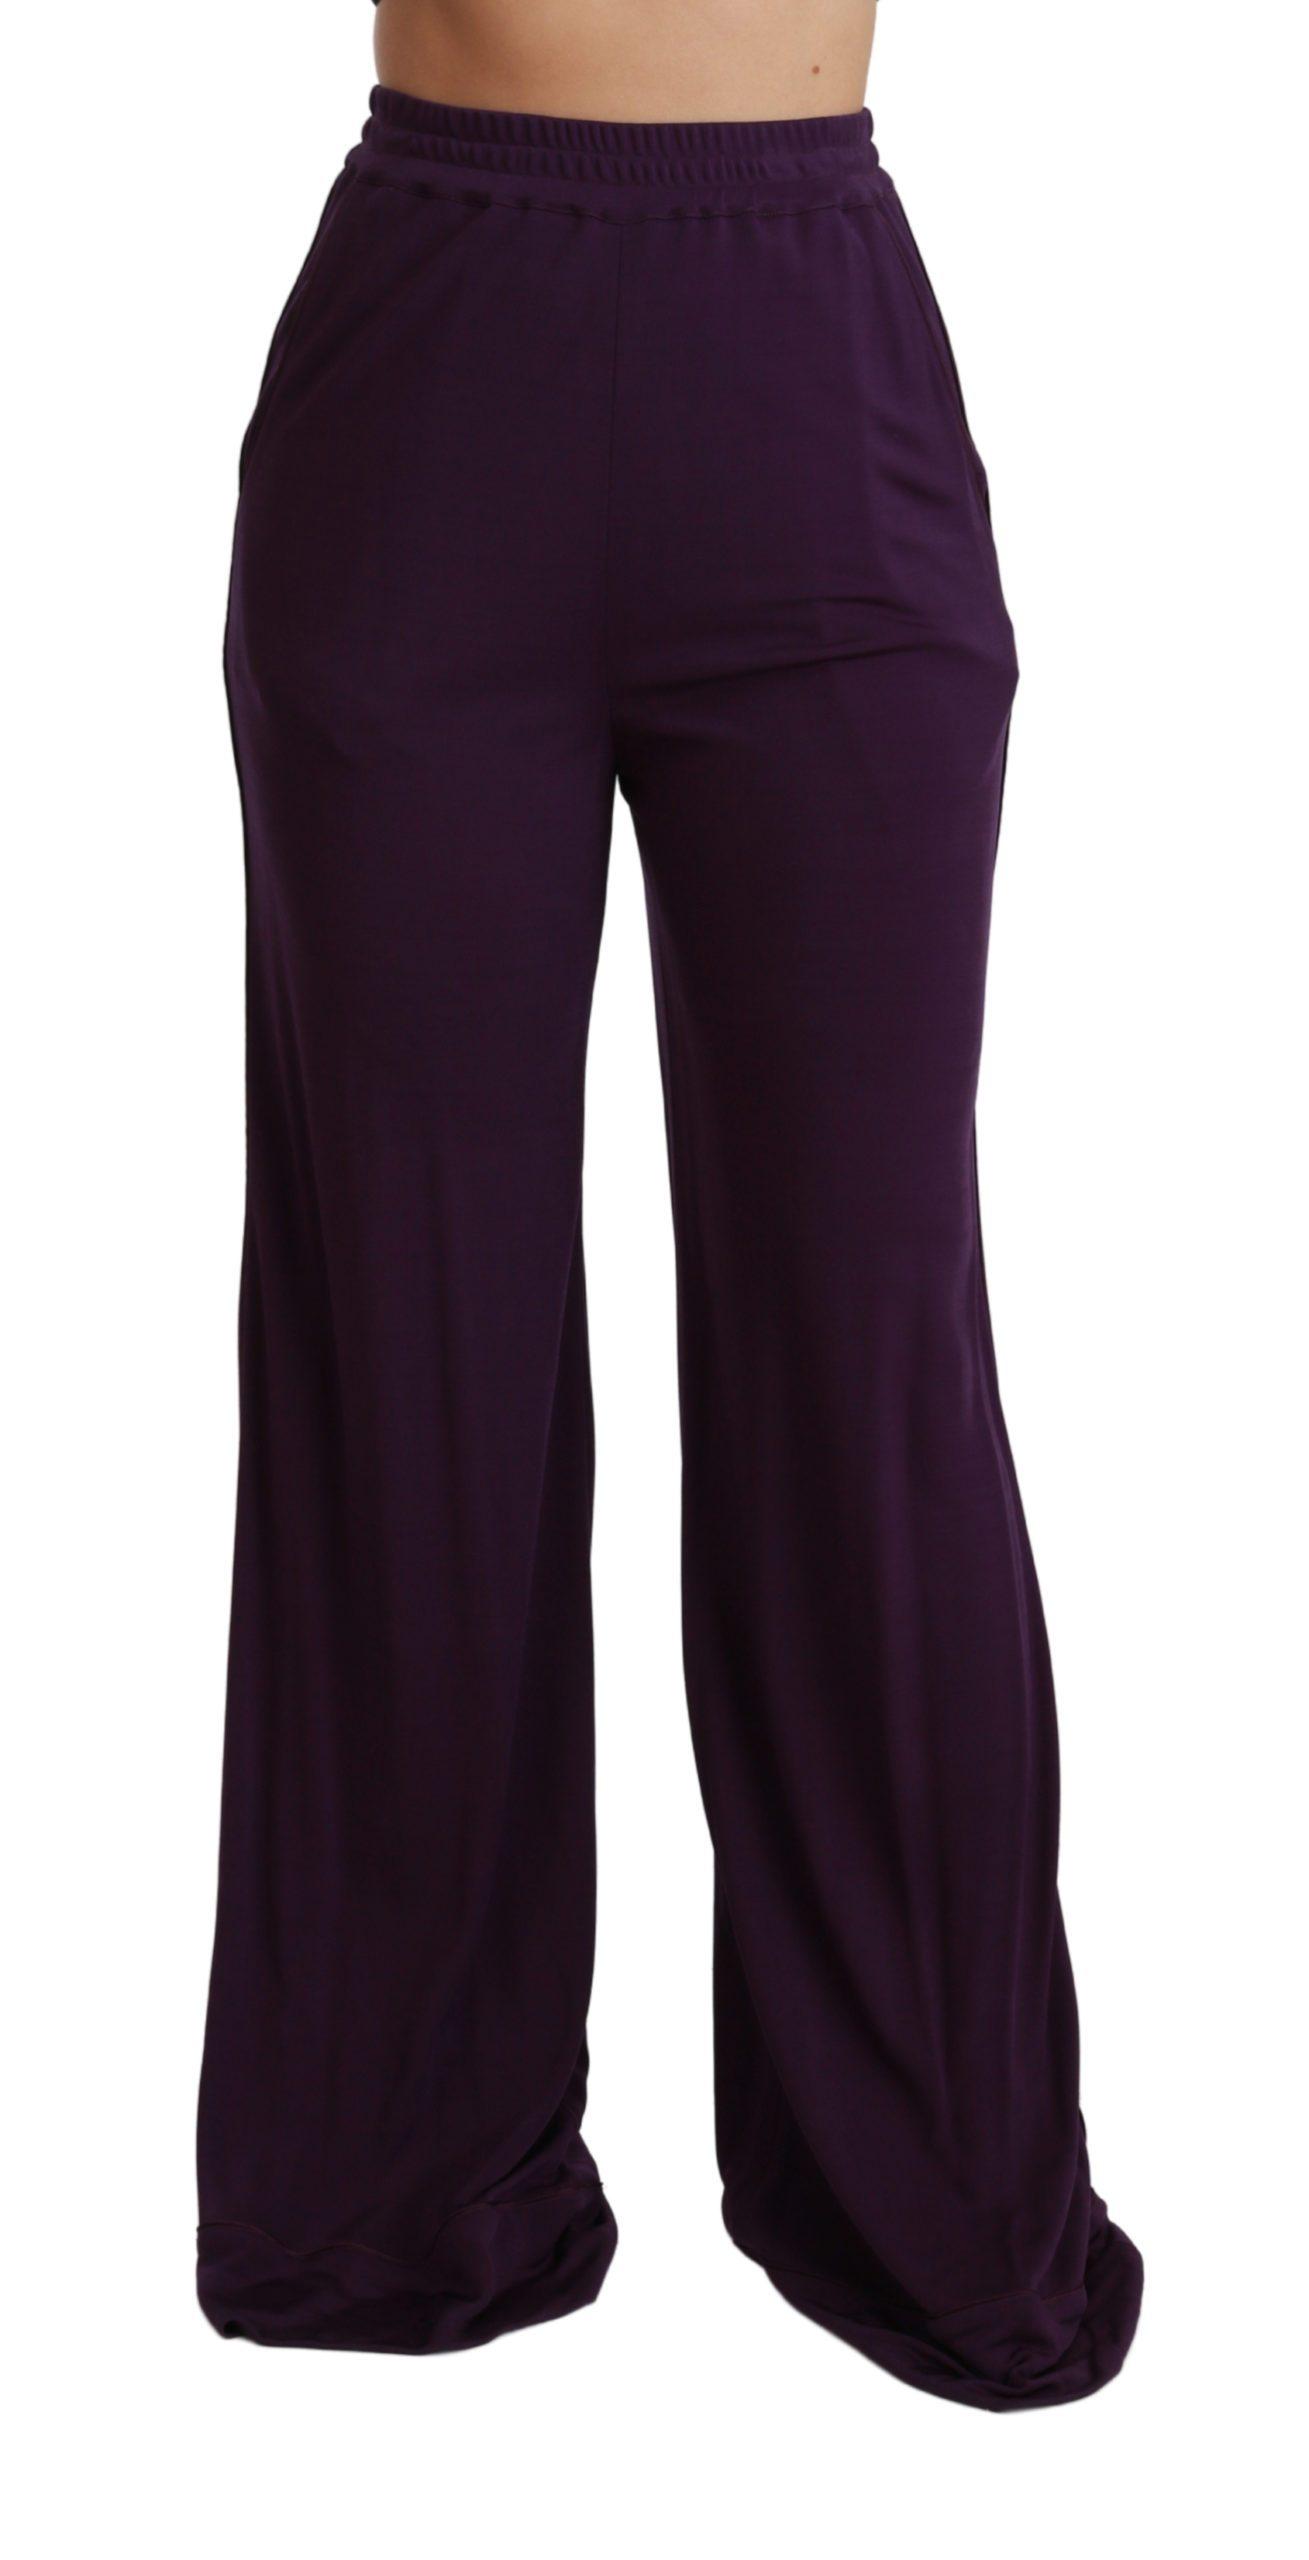 Dolce & Gabbana Women's High Waist Wide Leg Trouser Purple PAN70939 - IT40|S